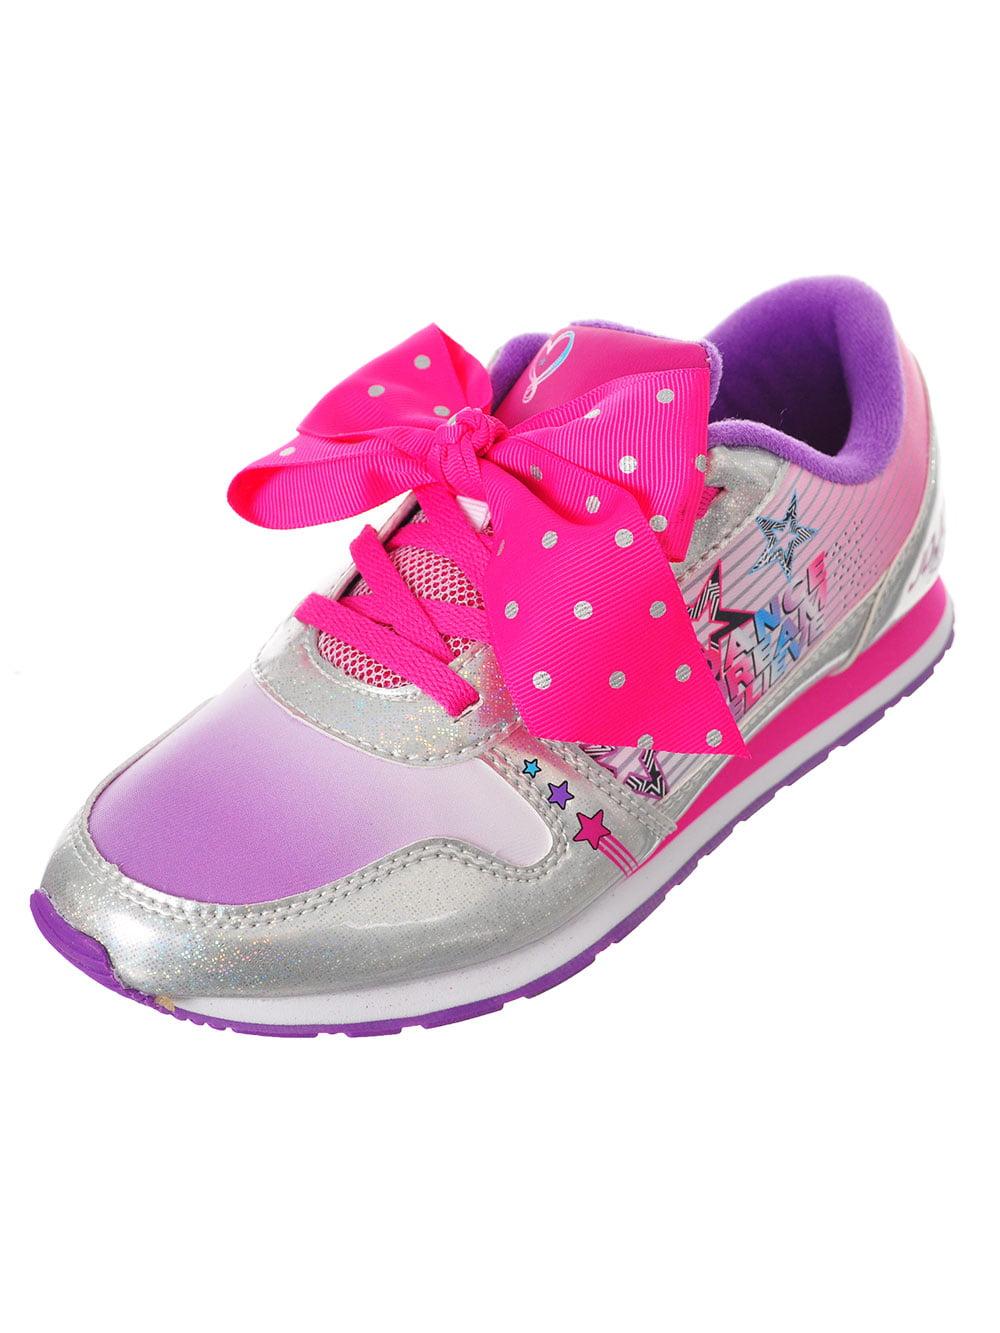 Jojo Siwa Girls' Sneakers (Sizes 13